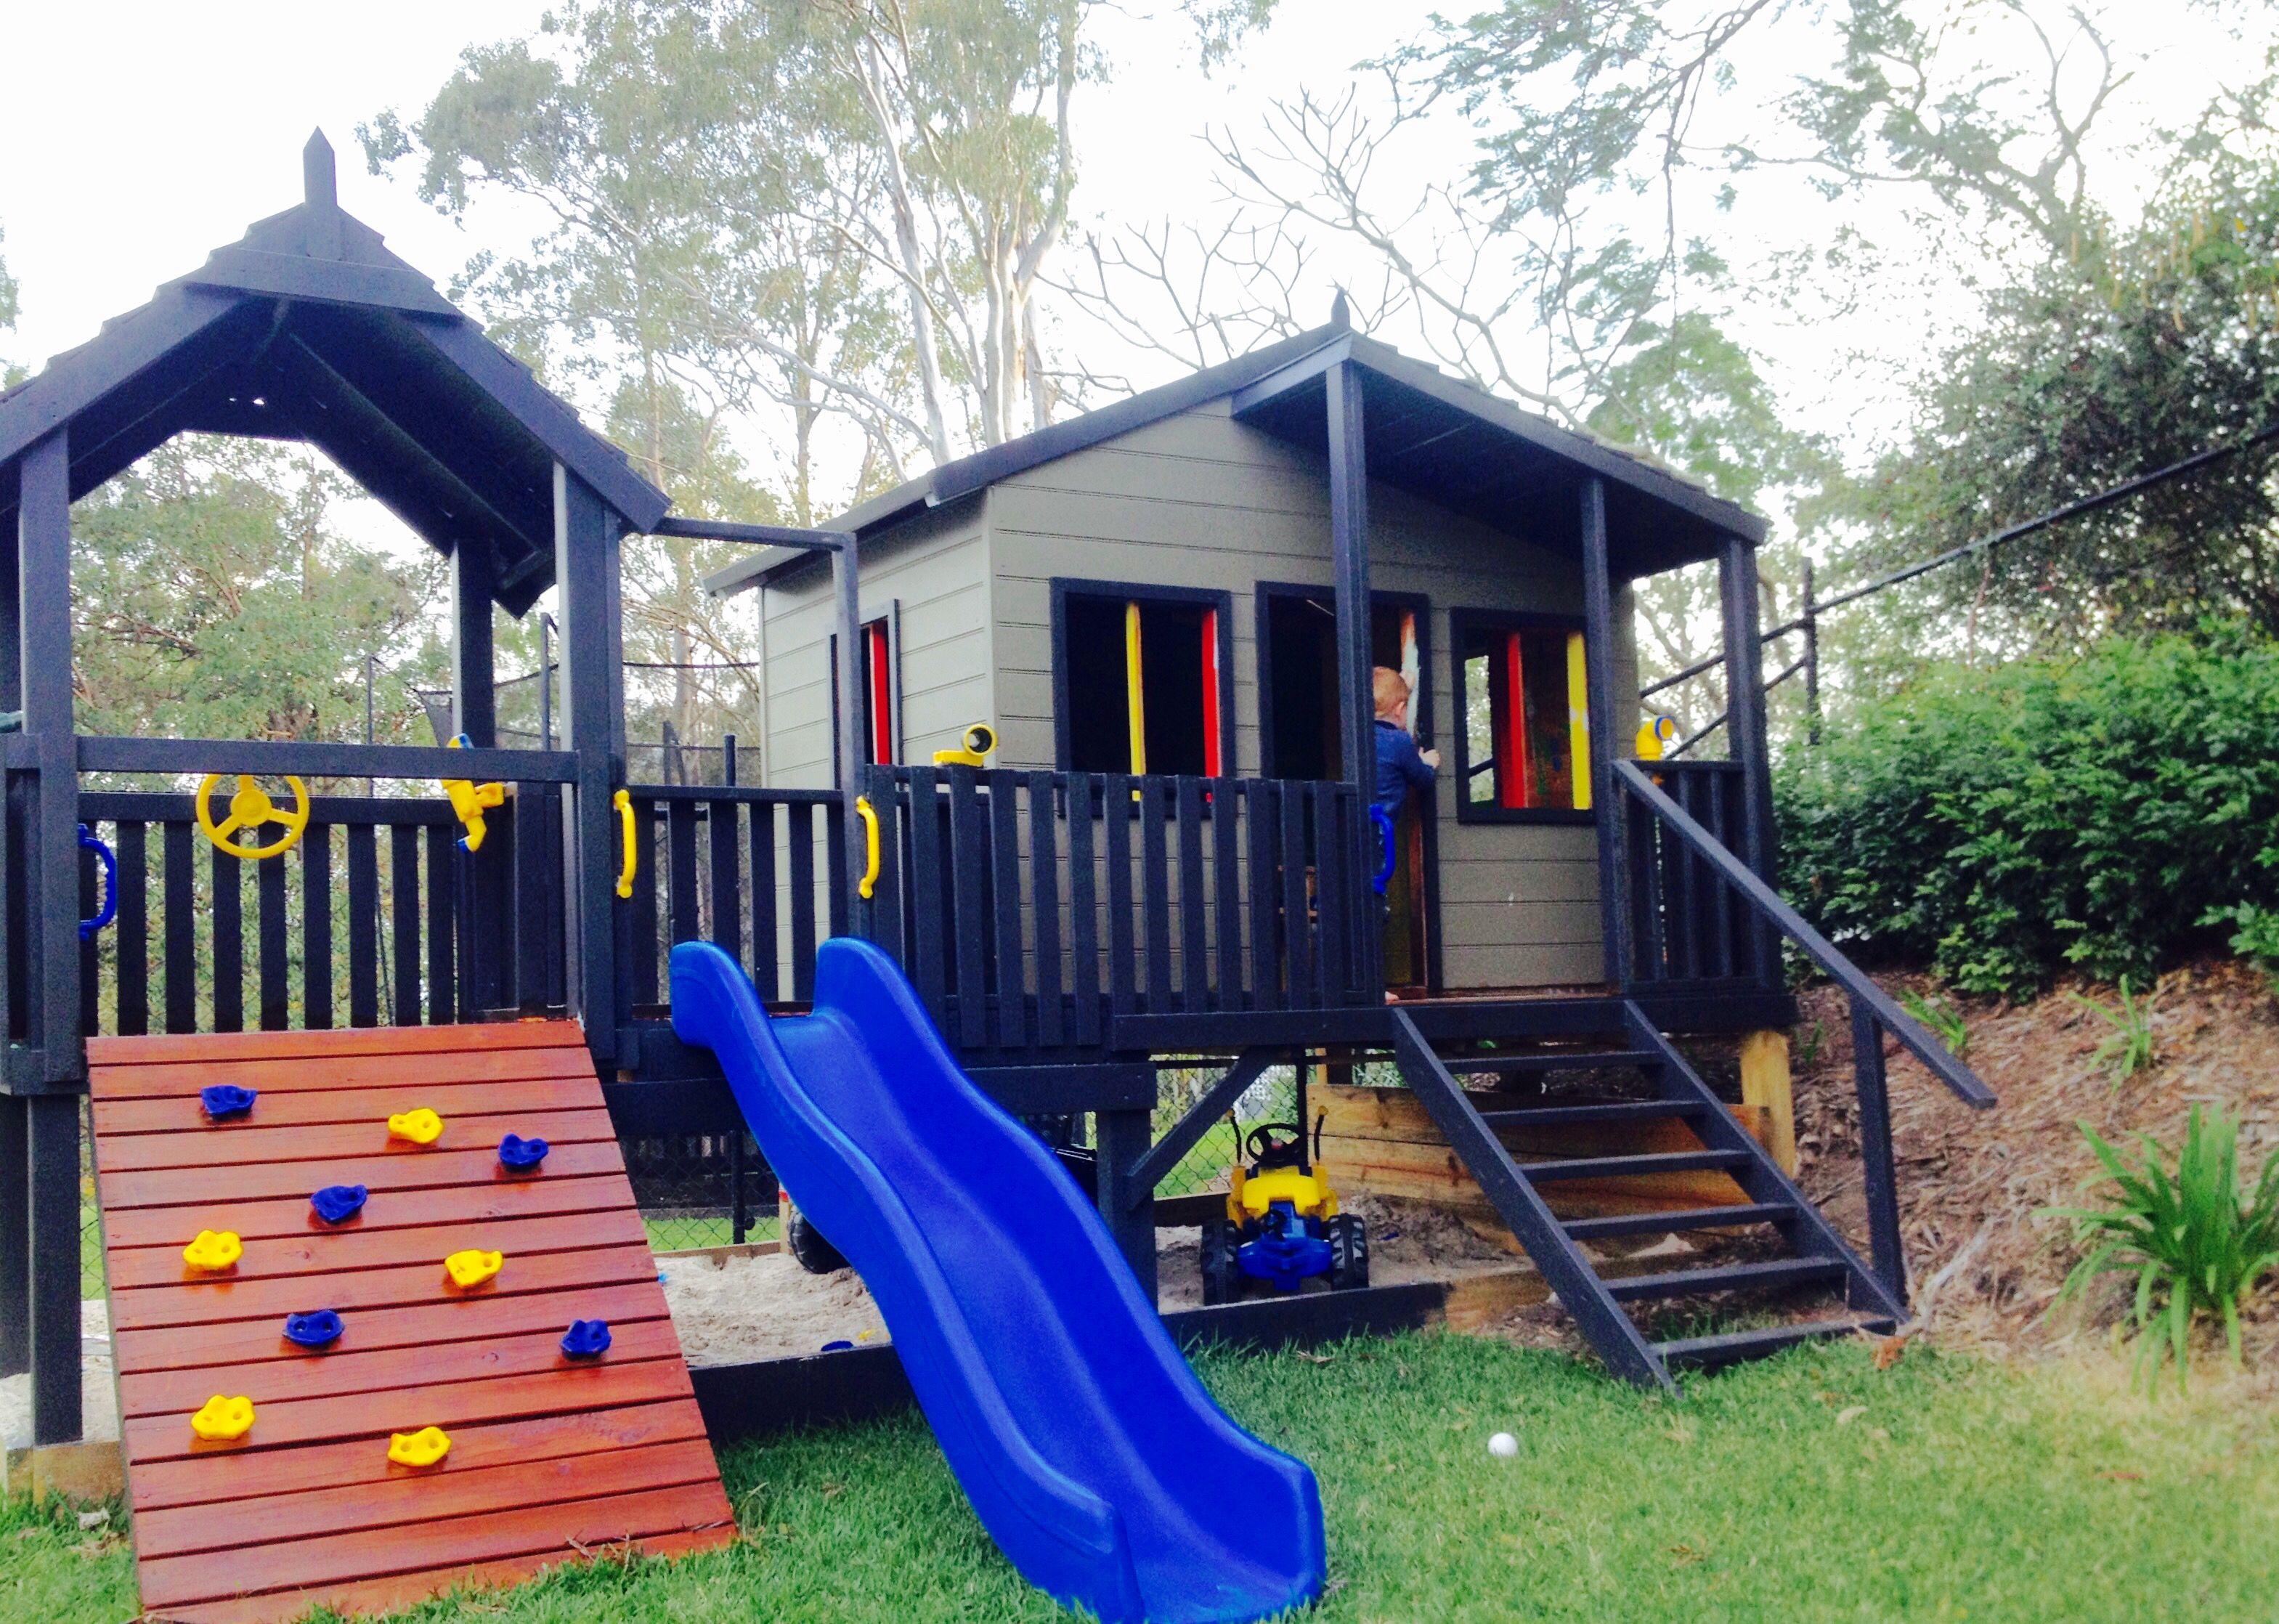 jayne lyddiard design cubby house in our brisbane backyard cubby